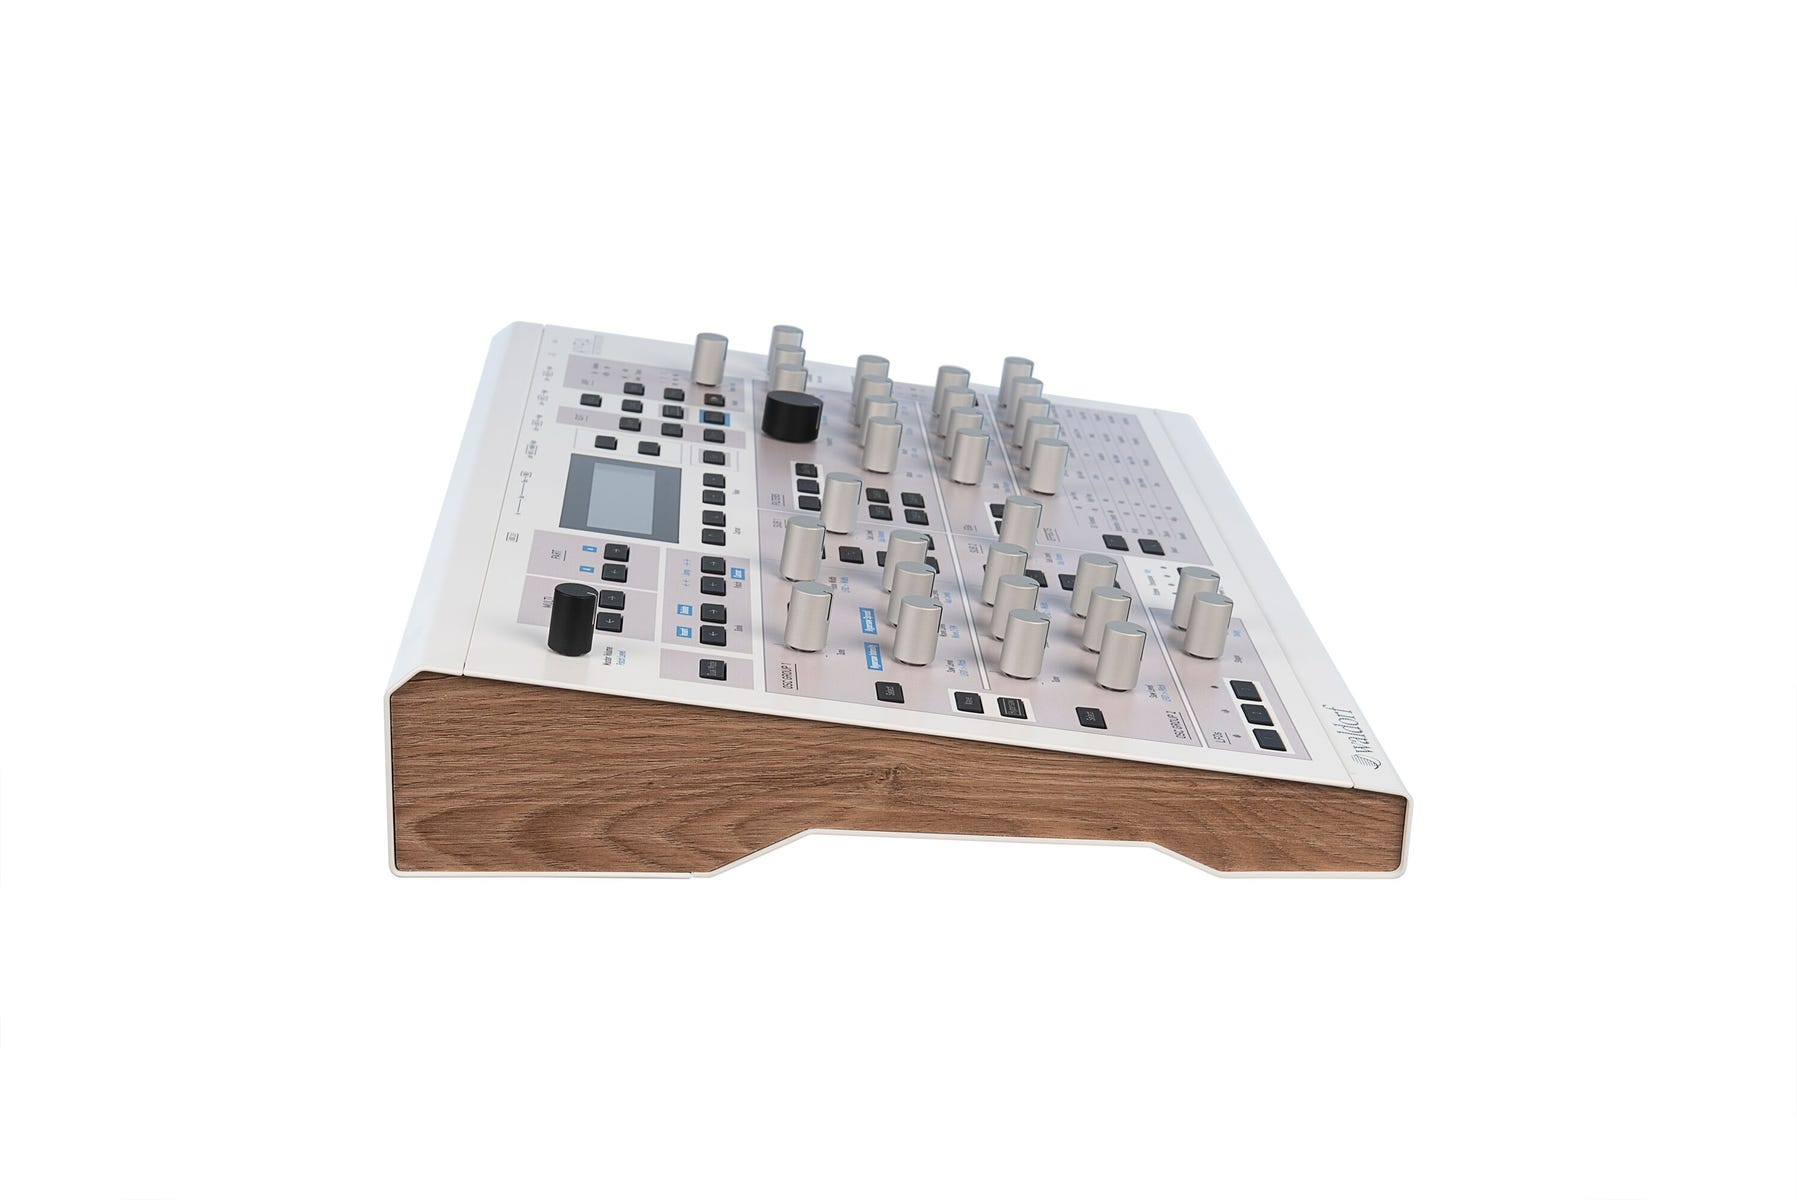 Waldorf KYRA Desktop VA Synthesizer Module